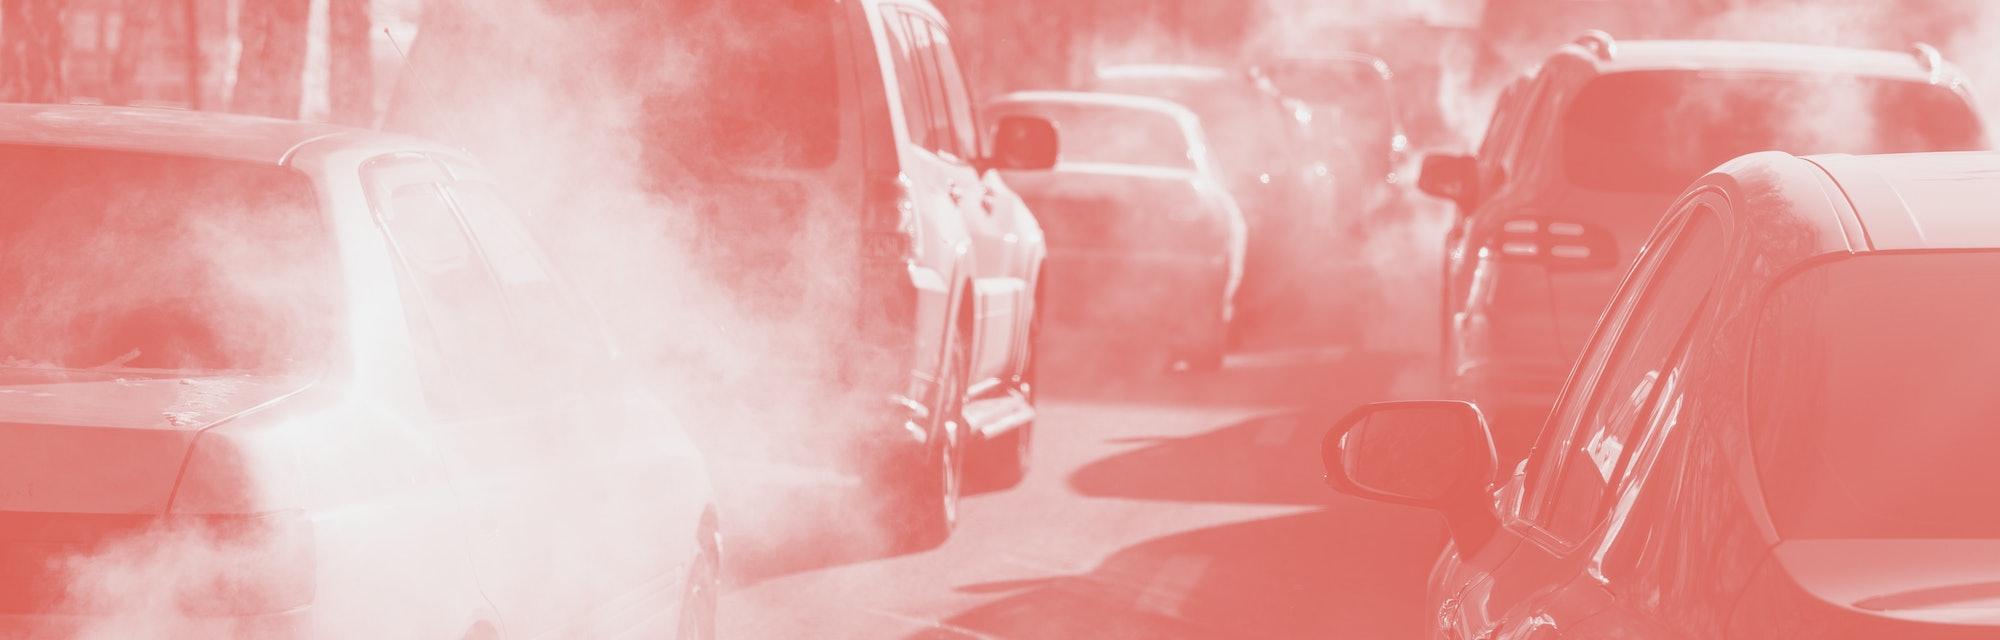 pollution car exhaust traffic